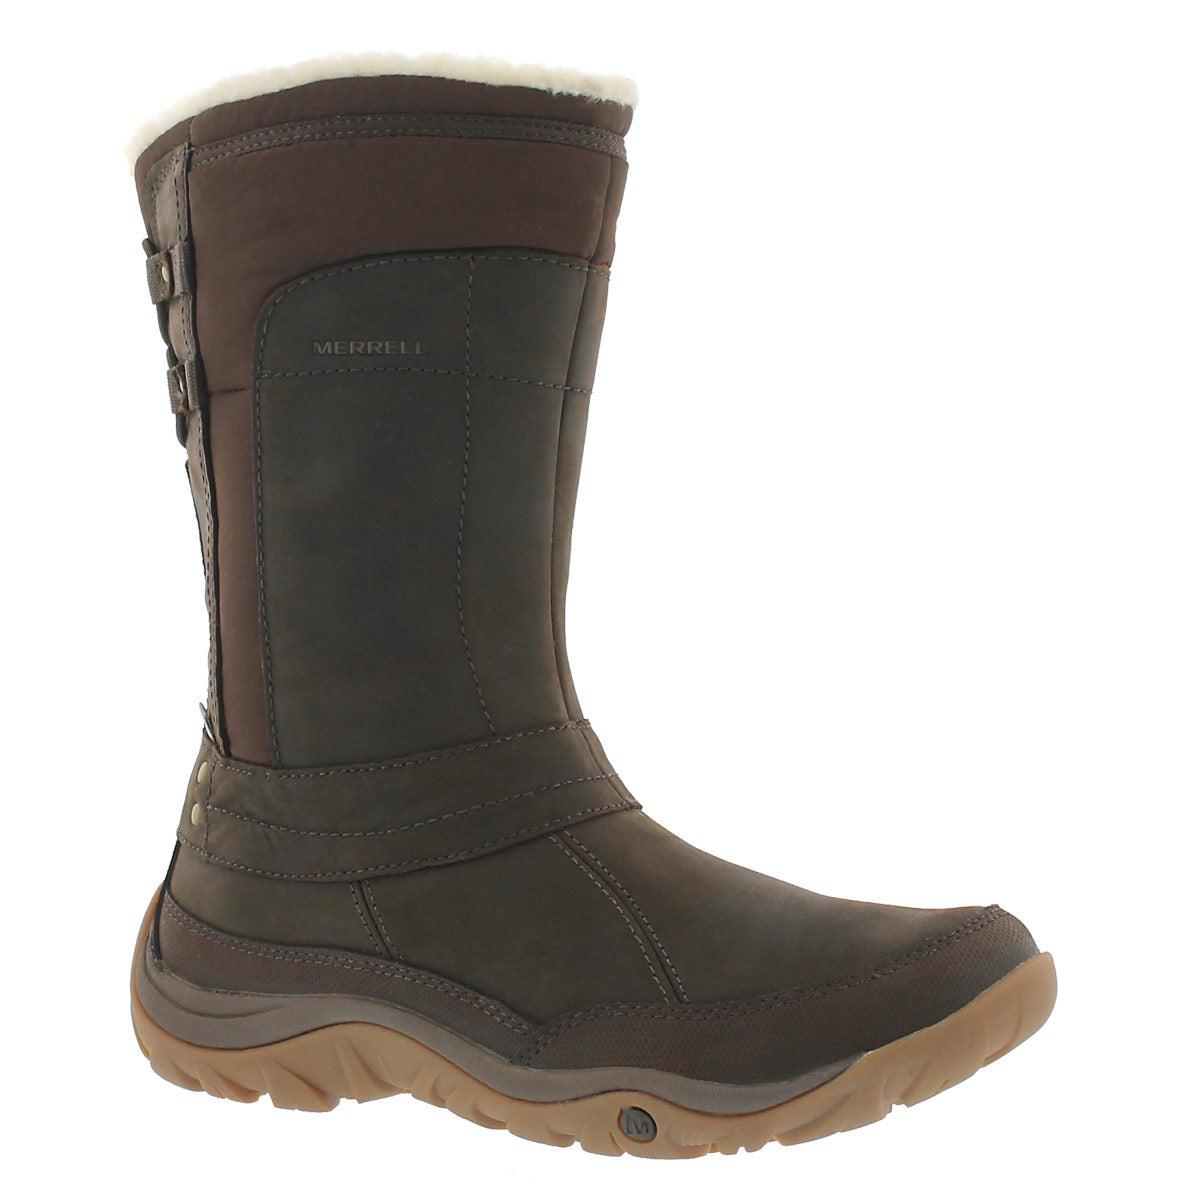 Lds Murren Mid wtpf bracken snow boot